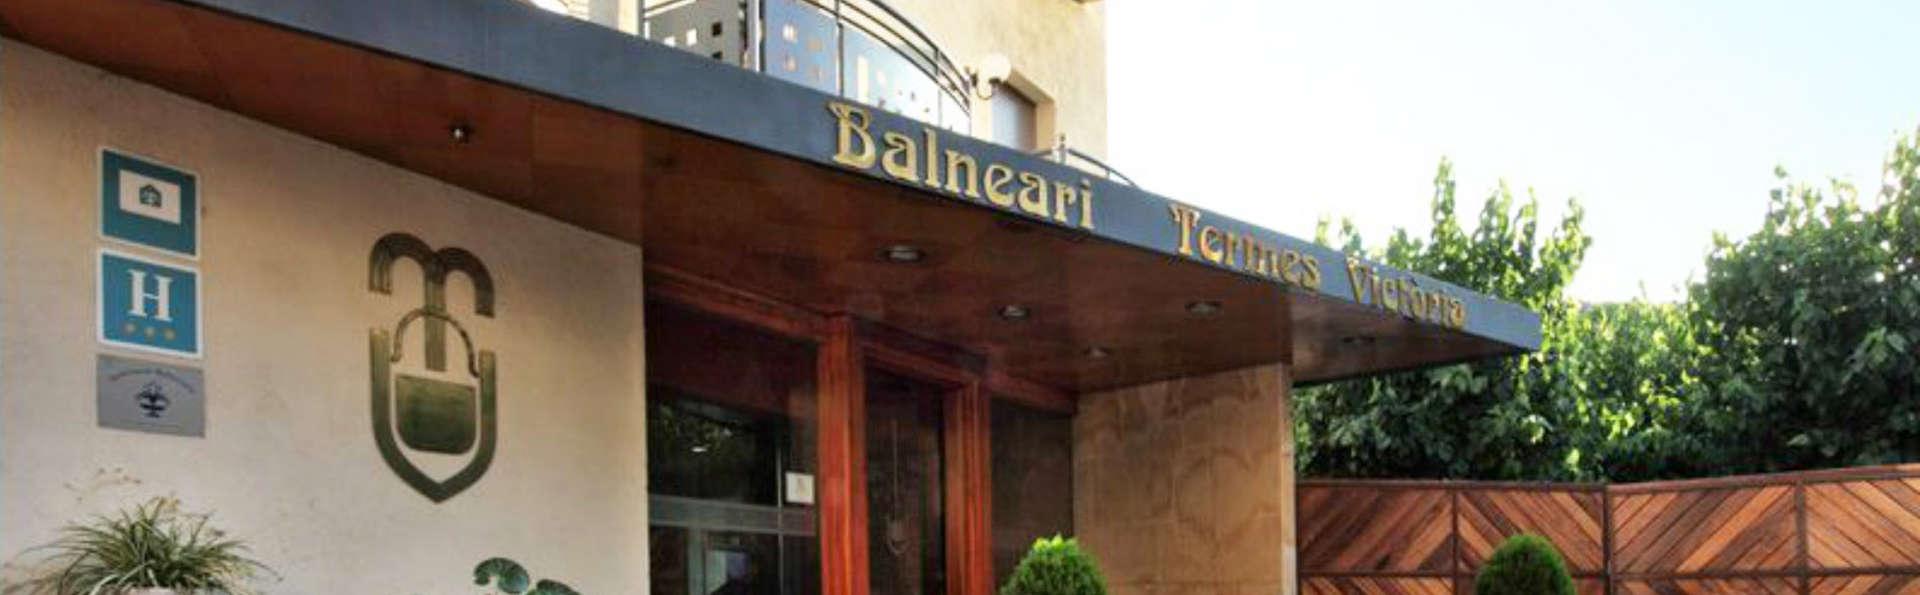 Balneario Termes Victòria - edit_front.jpg